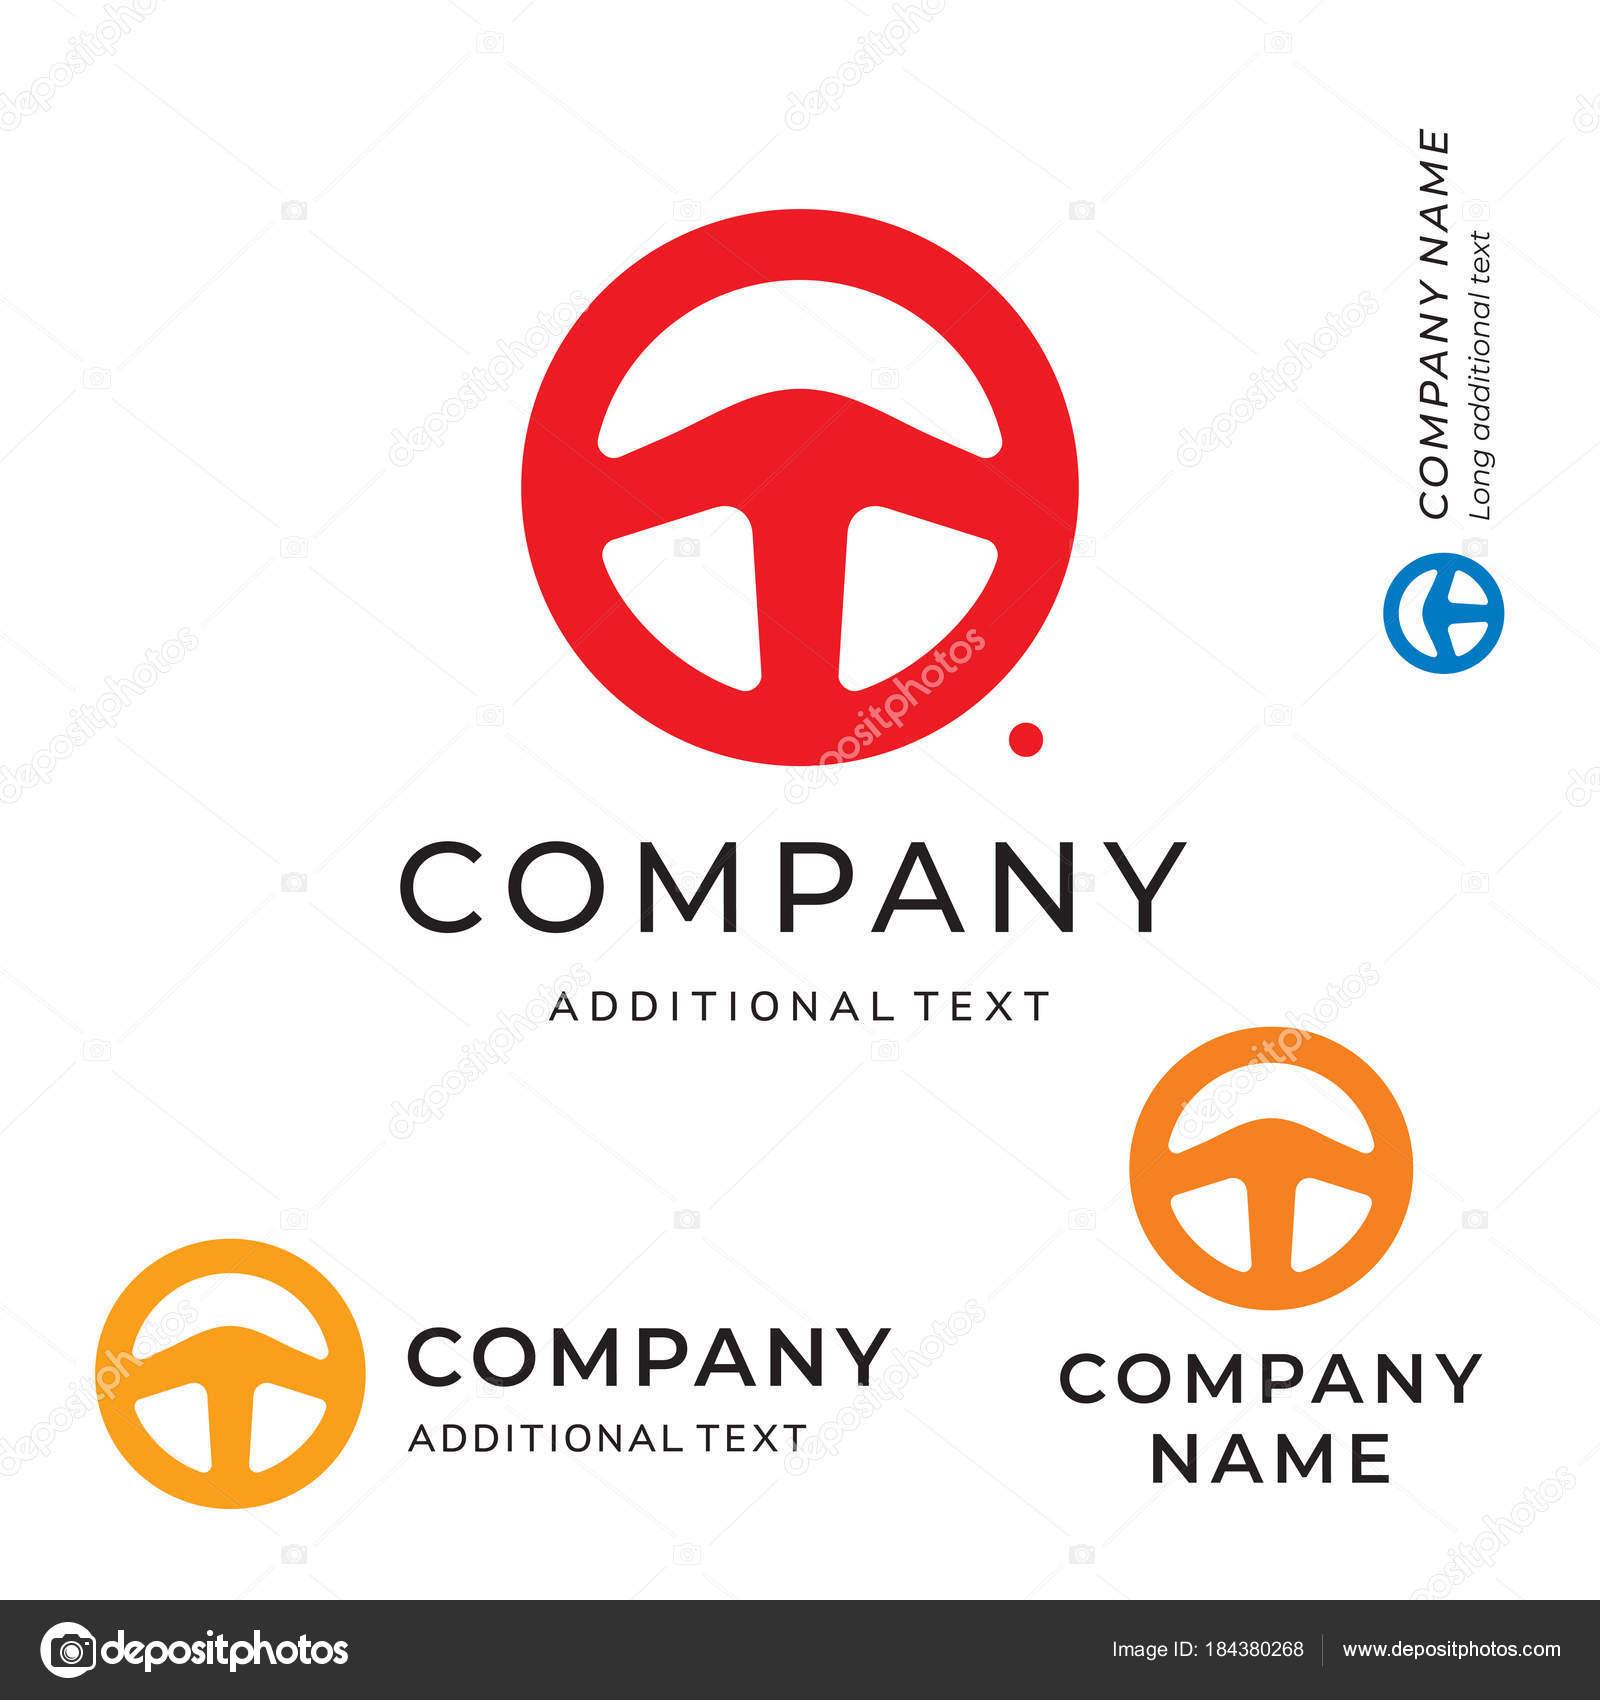 Steering wheel shape logo emblem modern simple and clean race steering wheel shape logo emblem modern simple and clean race identity brand icon symbol concept set buycottarizona